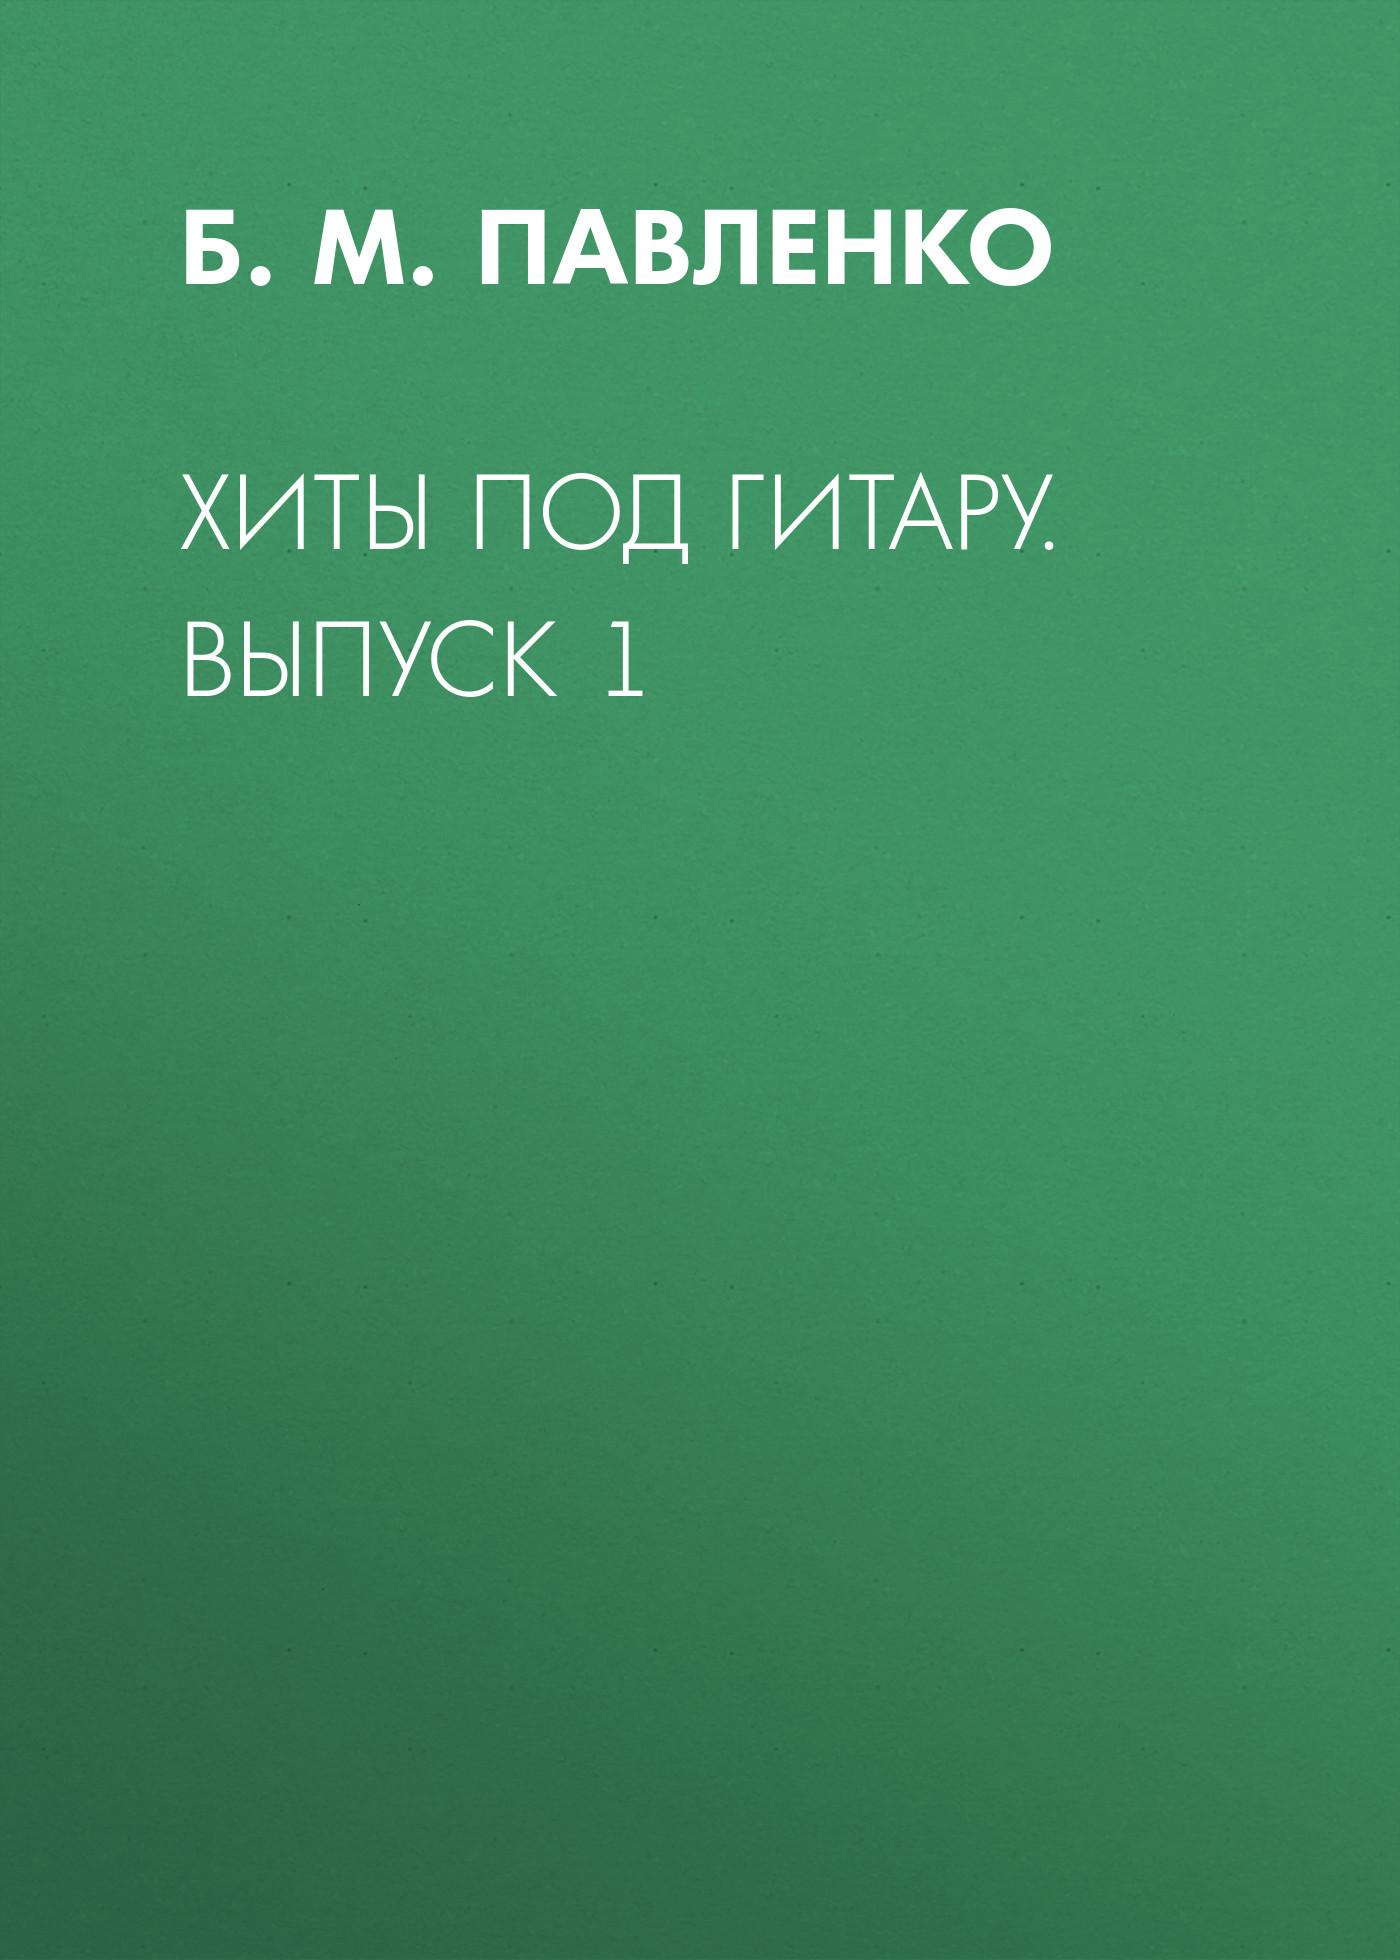 Б. М. Павленко Хиты под гитару. Выпуск 1 б м павленко хиты под гитару выпуск 1